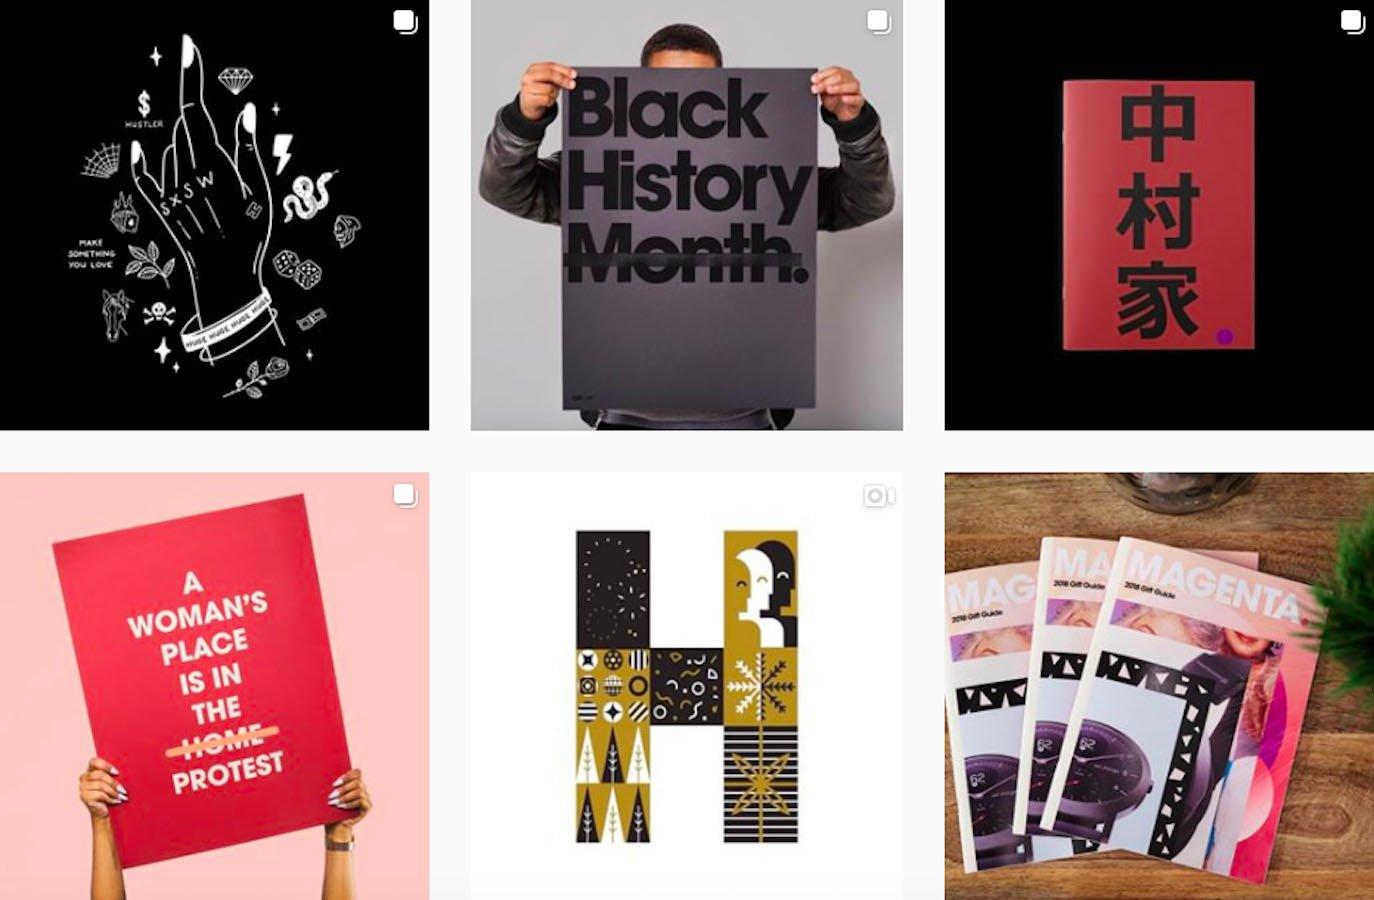 Web Design Inspiration: 110+ Accounts On Instagram and 10+ Best UX & Web Design Books in 2020 - hugeinc